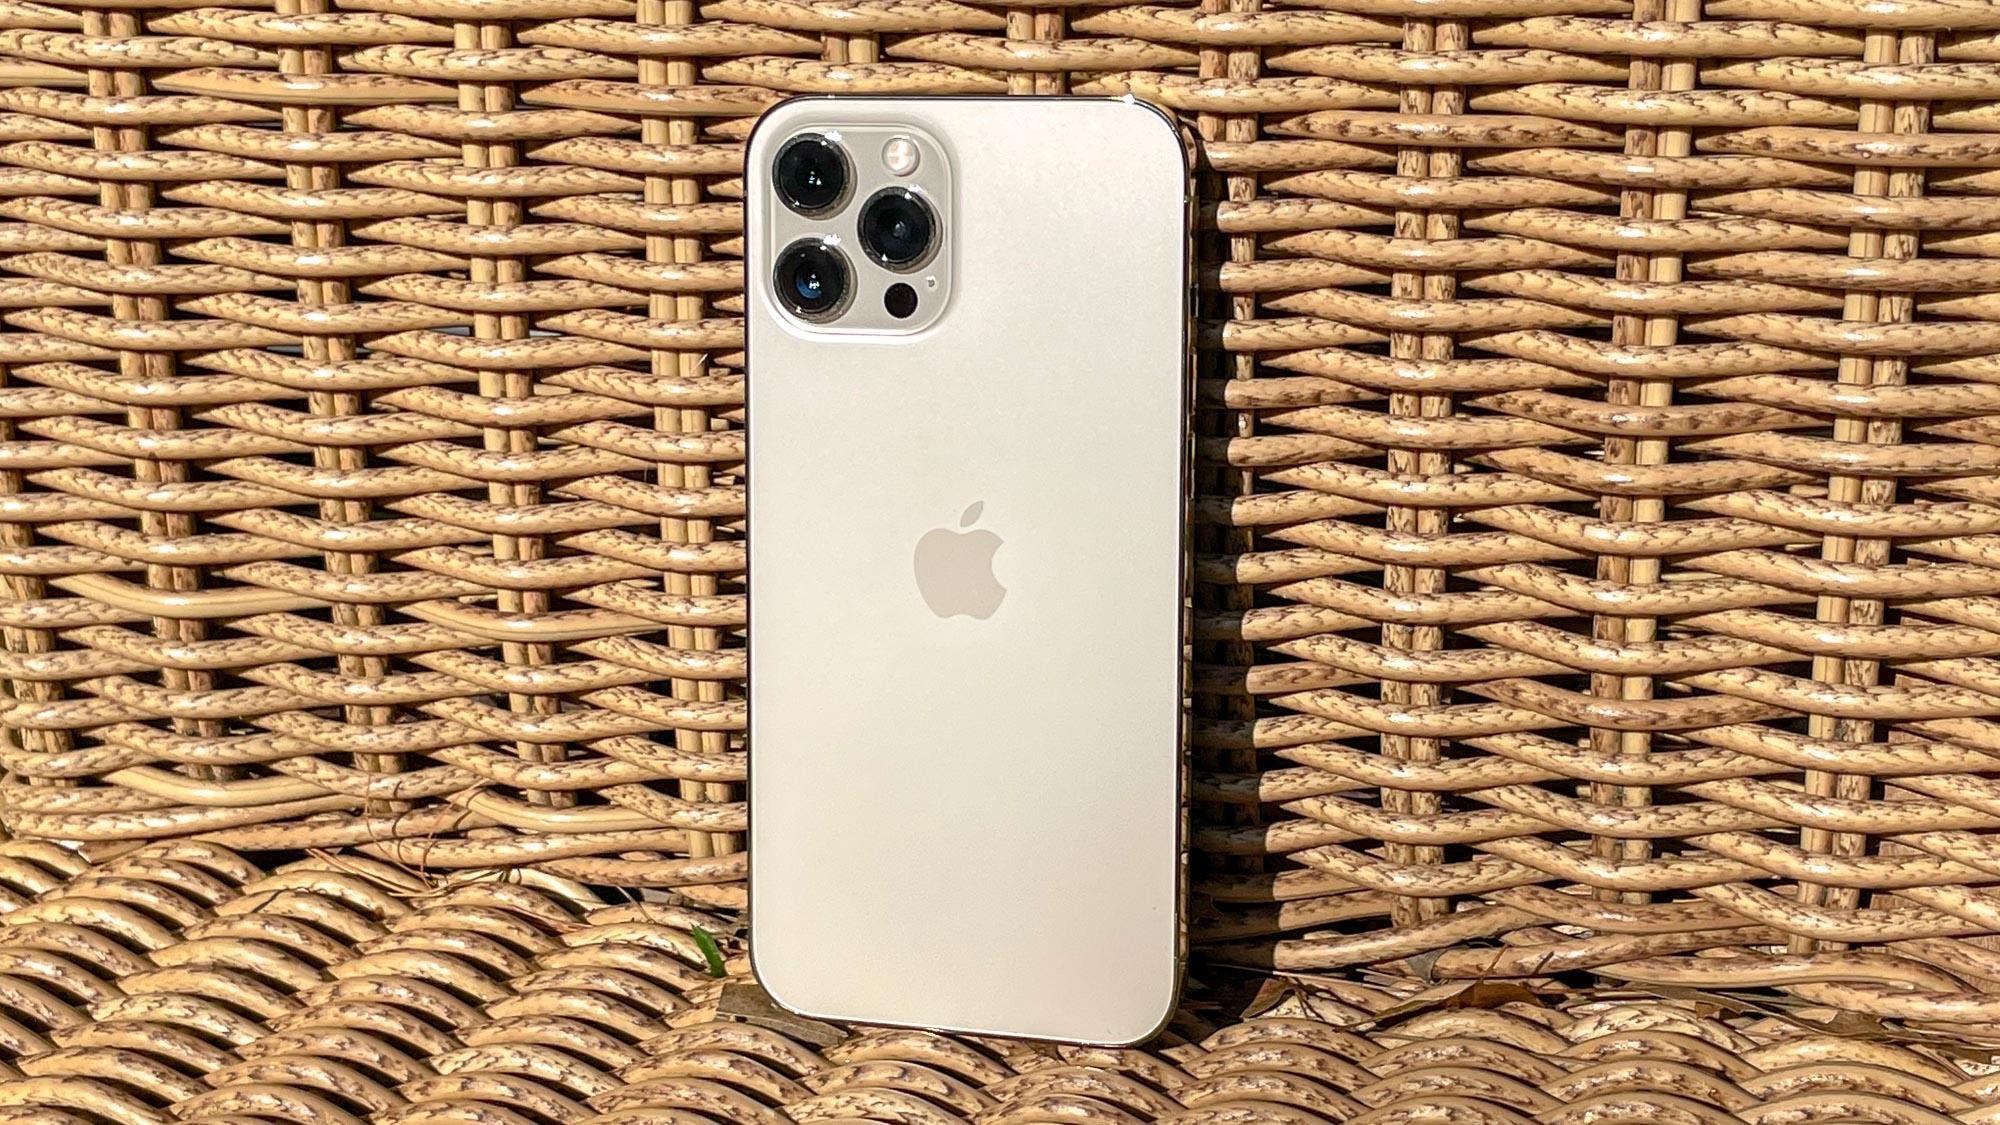 iPhone 13 camera leaks